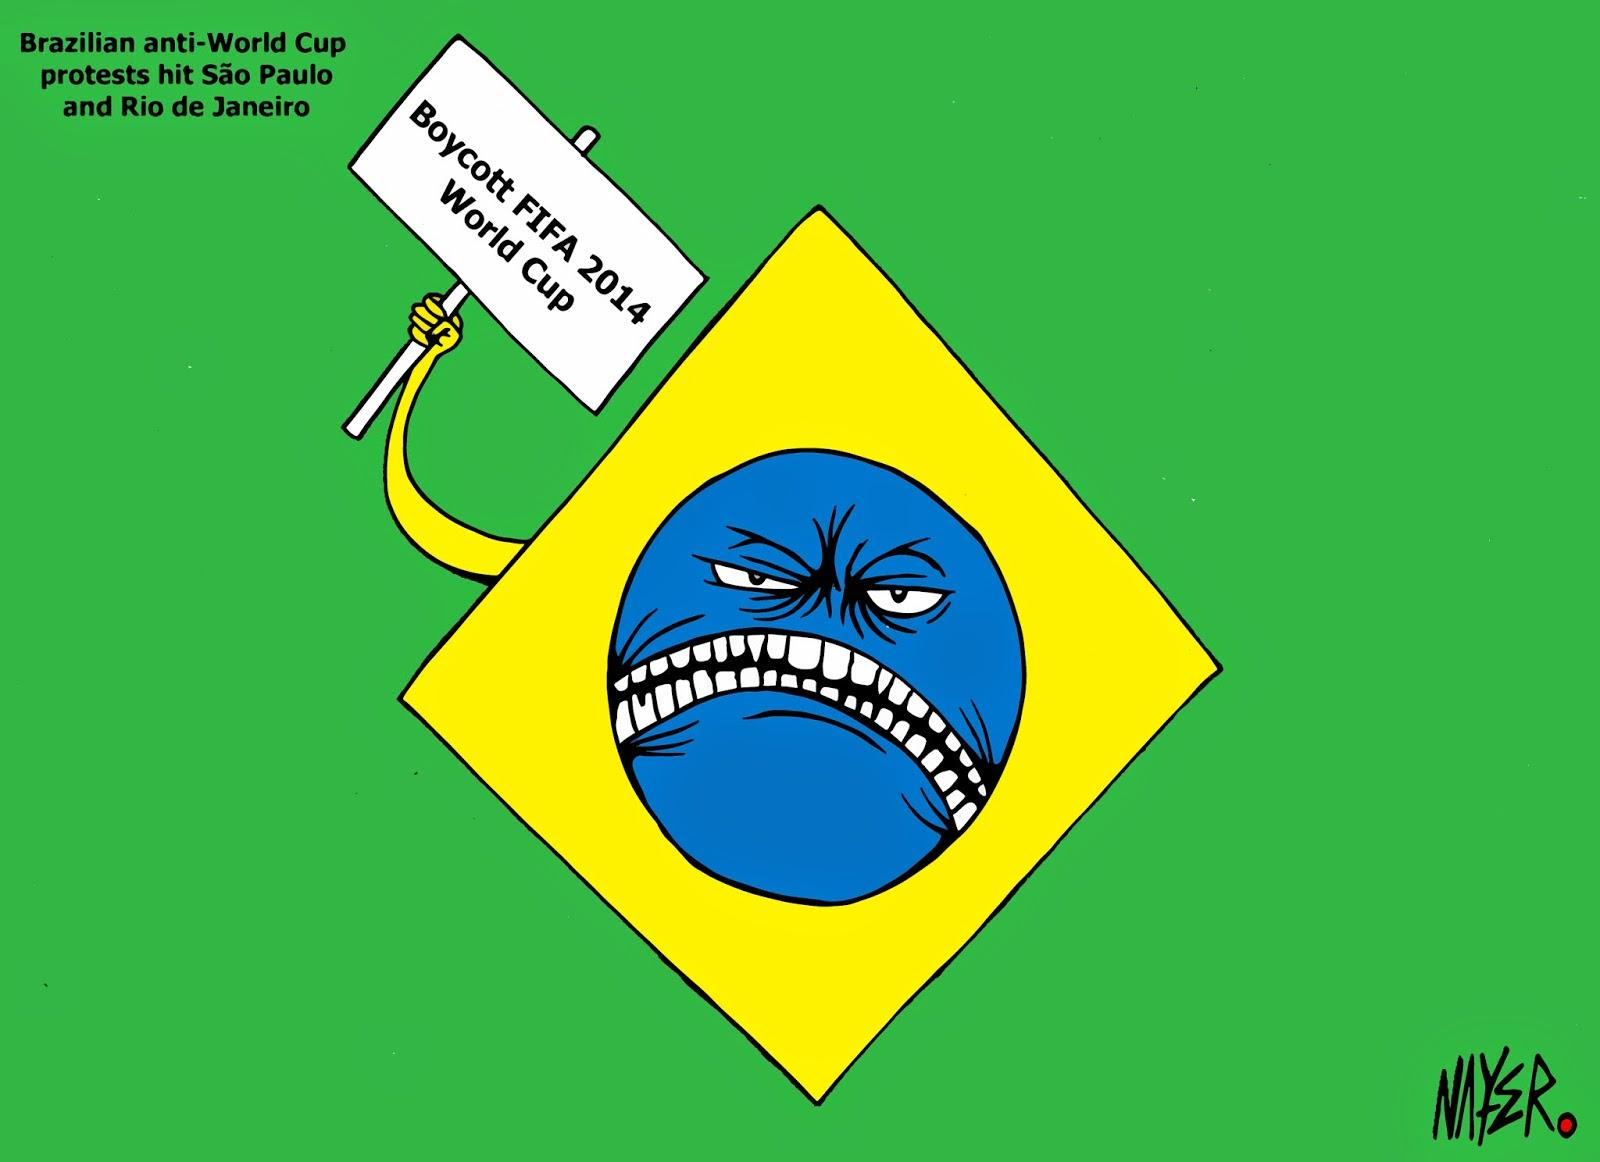 16-5-2014+-+World+Cup+Brazil.jpg